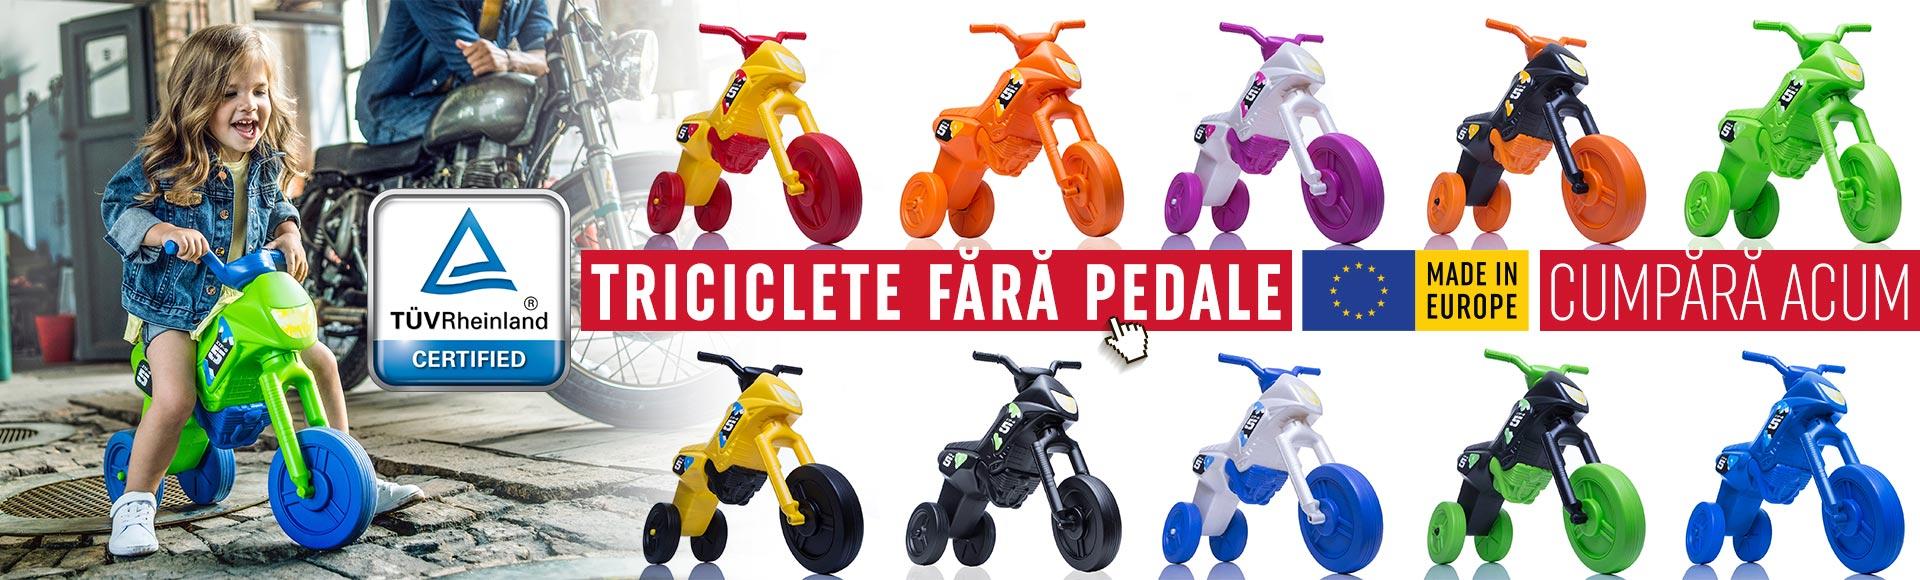 Enduro X - Triciclete fara pedale 2020